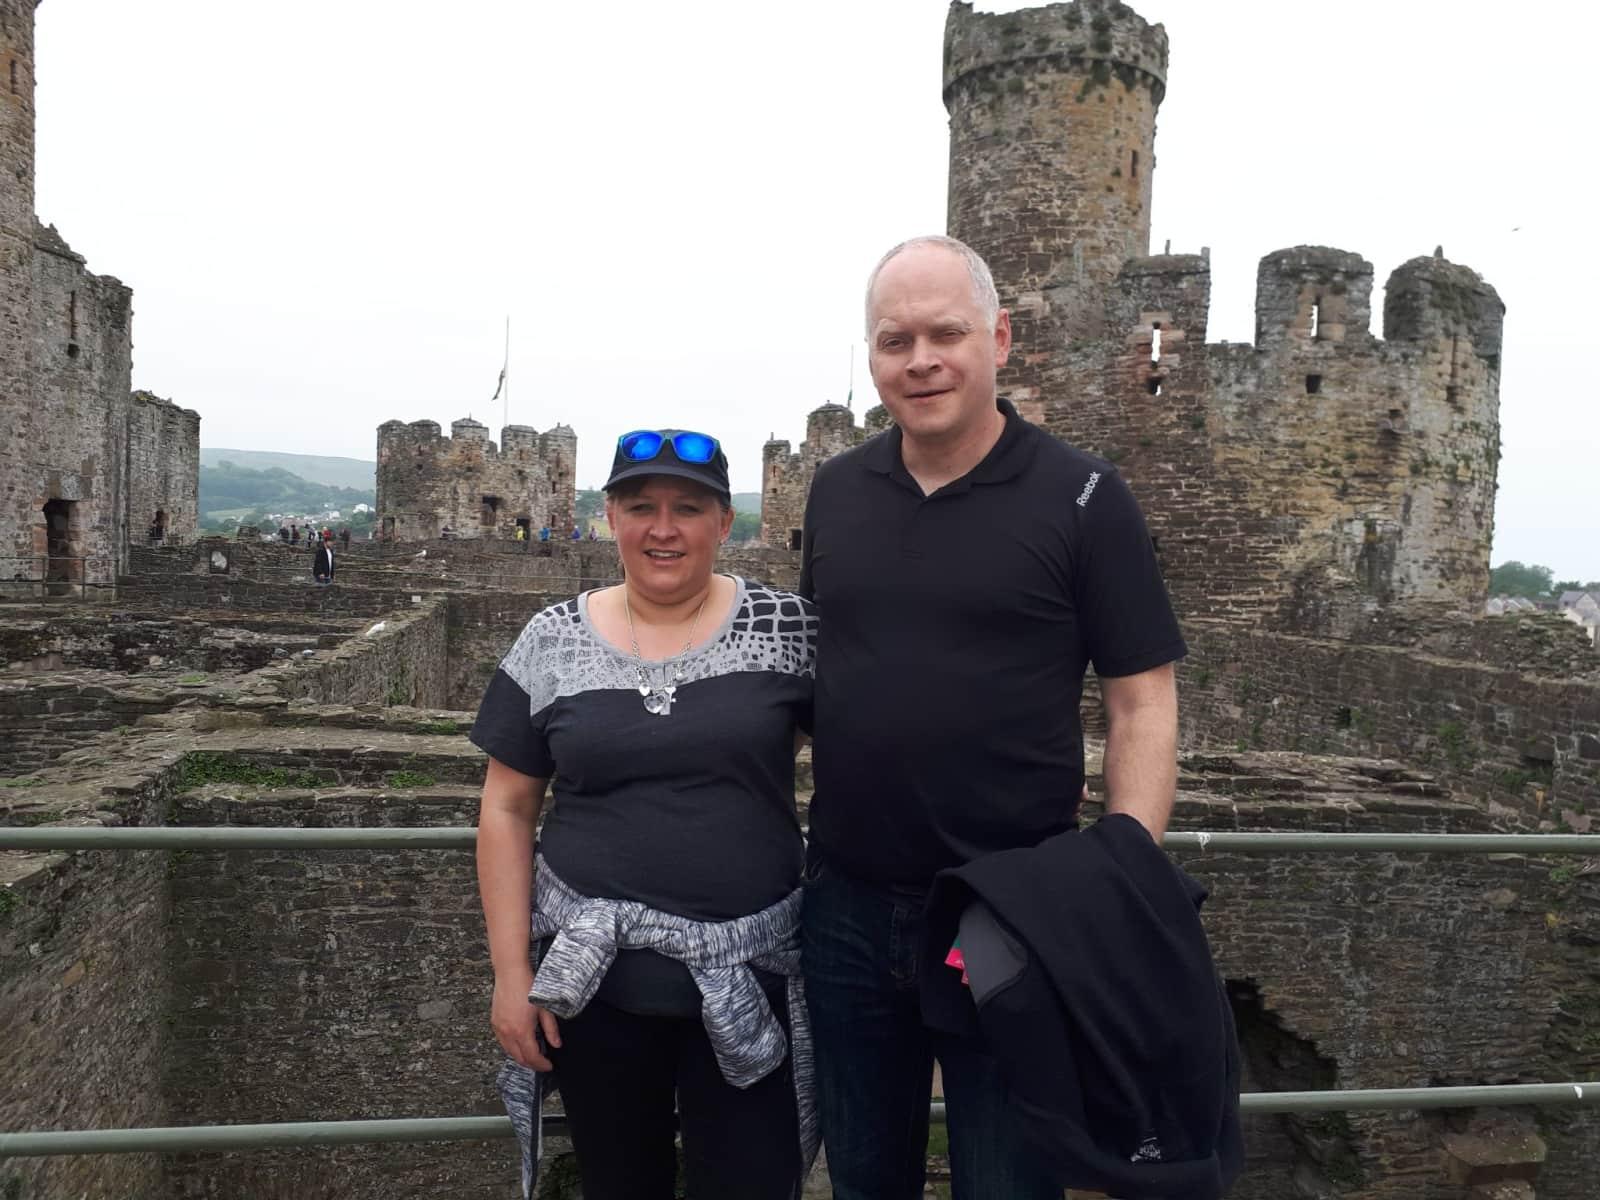 Sean & Judie from Cranbrook, British Columbia, Canada